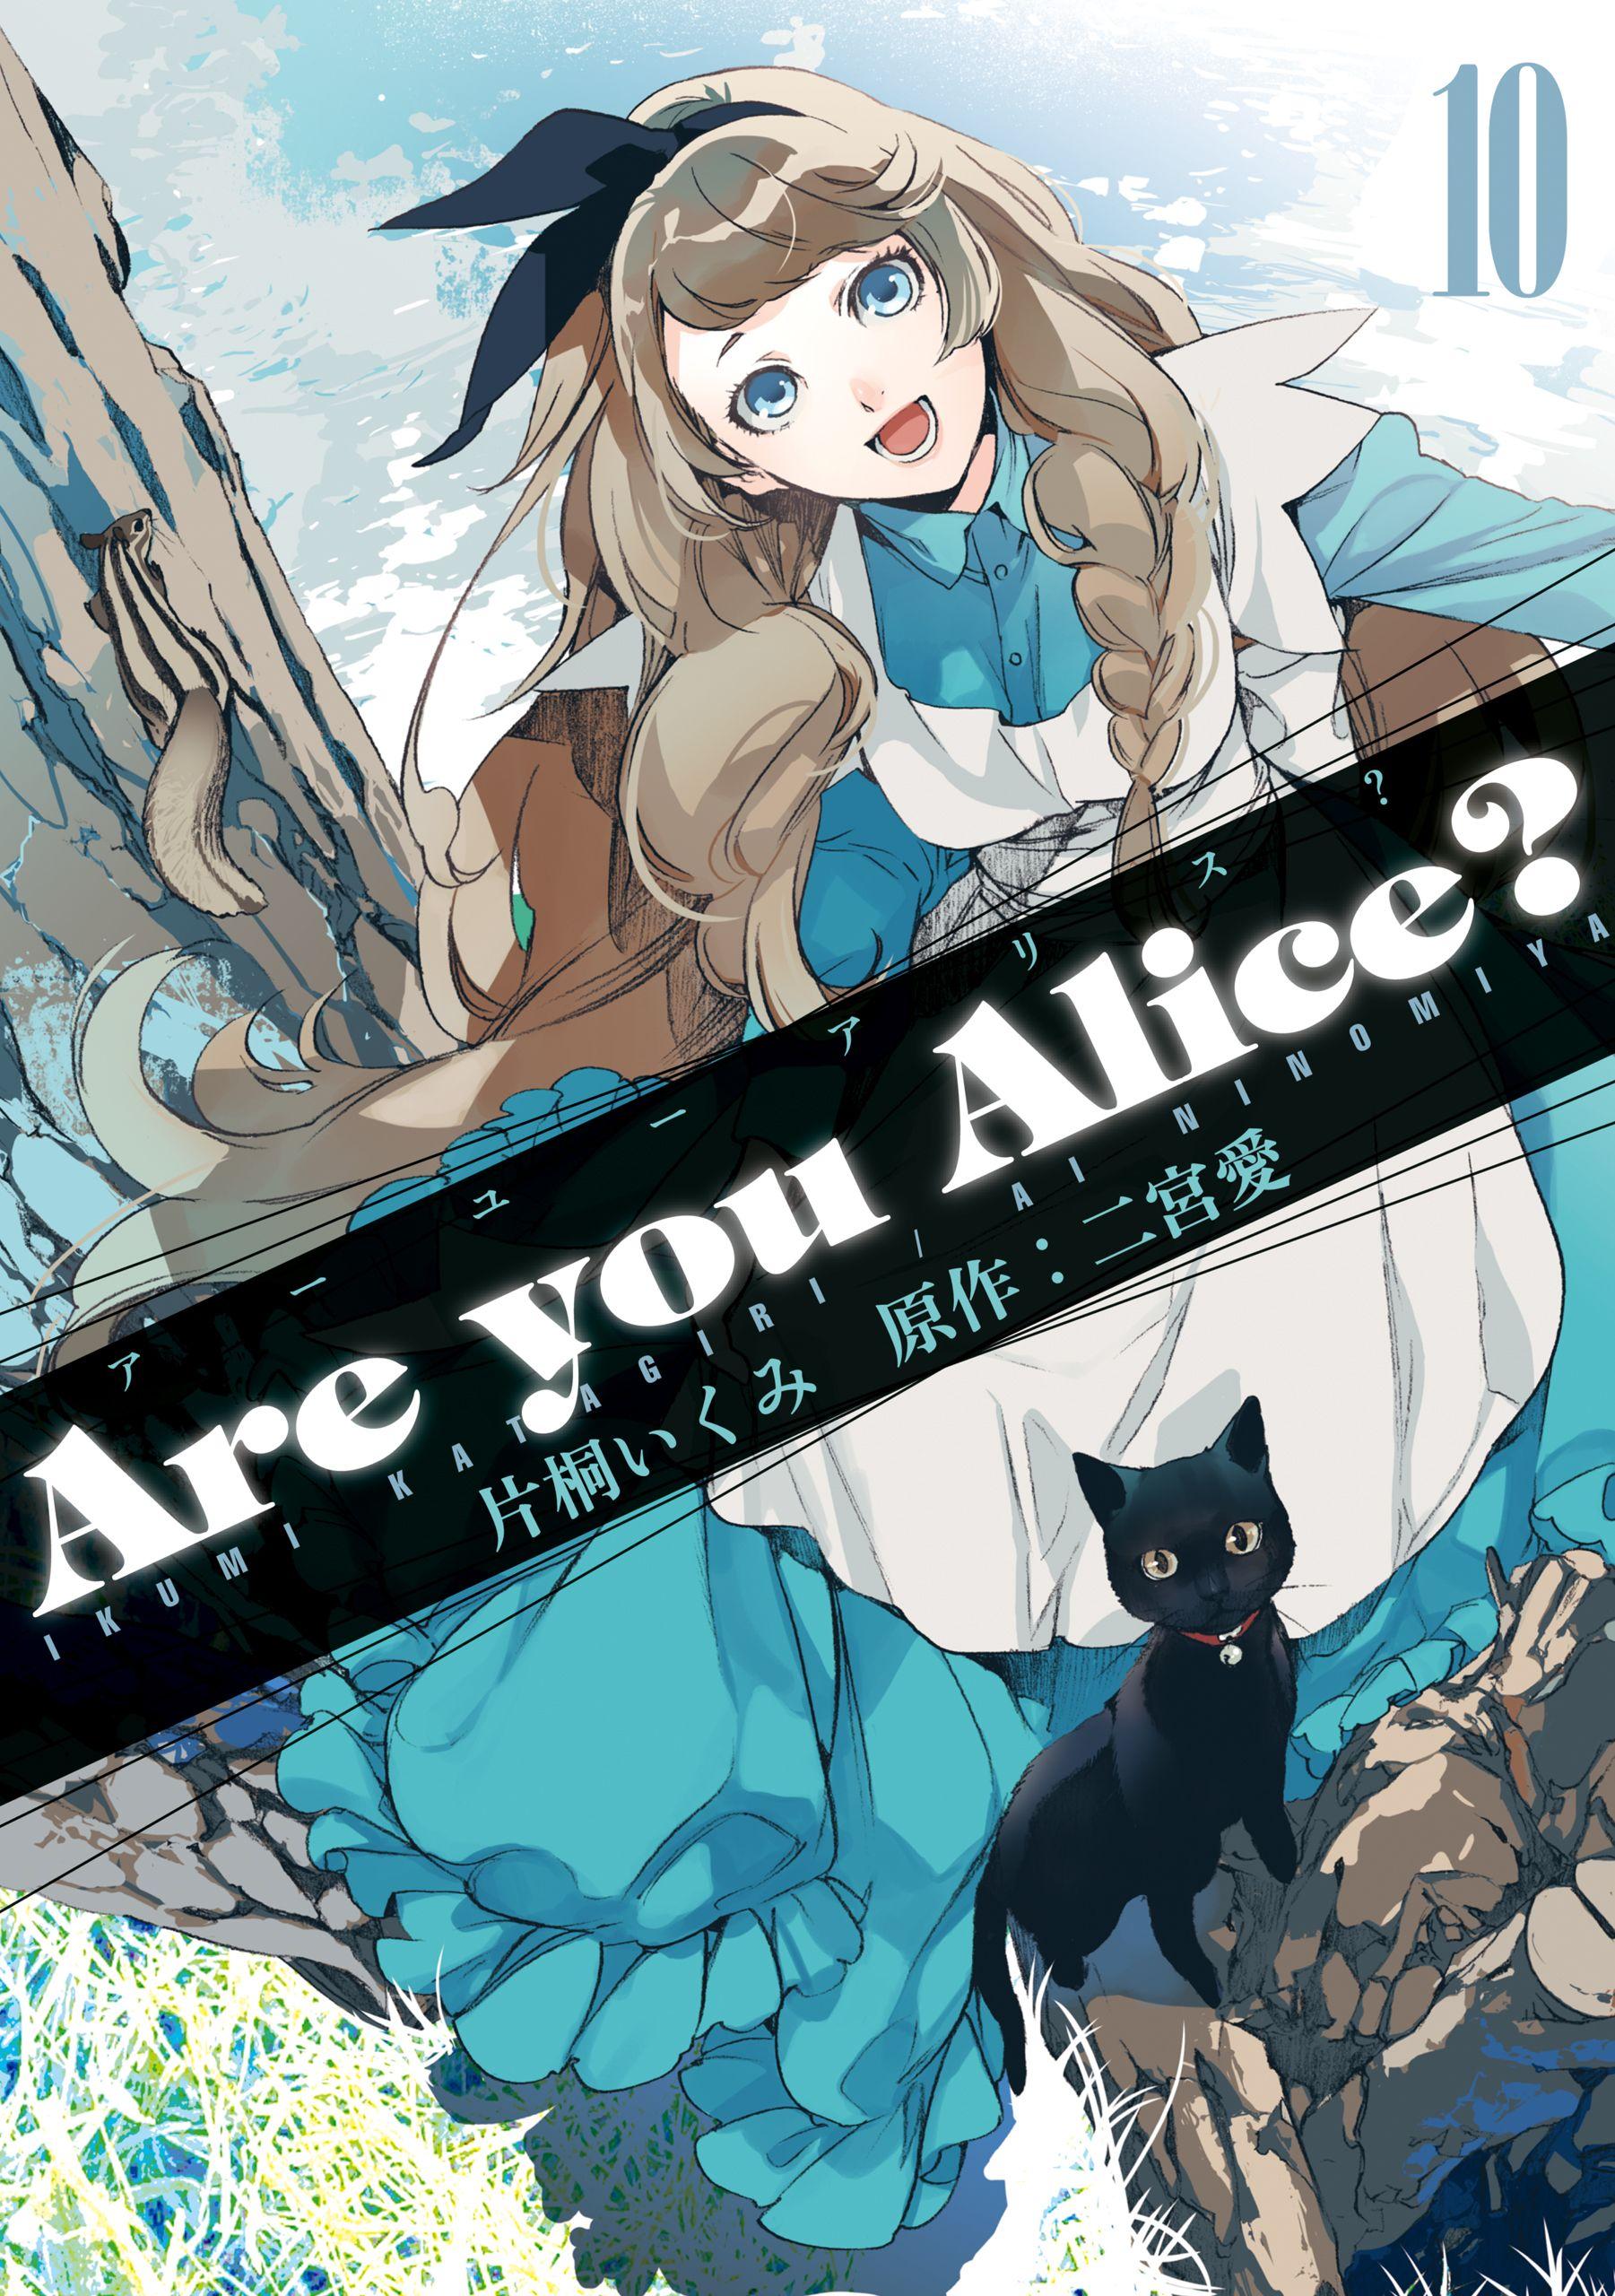 Are You Alice? Alice anime, Anime, Manga covers